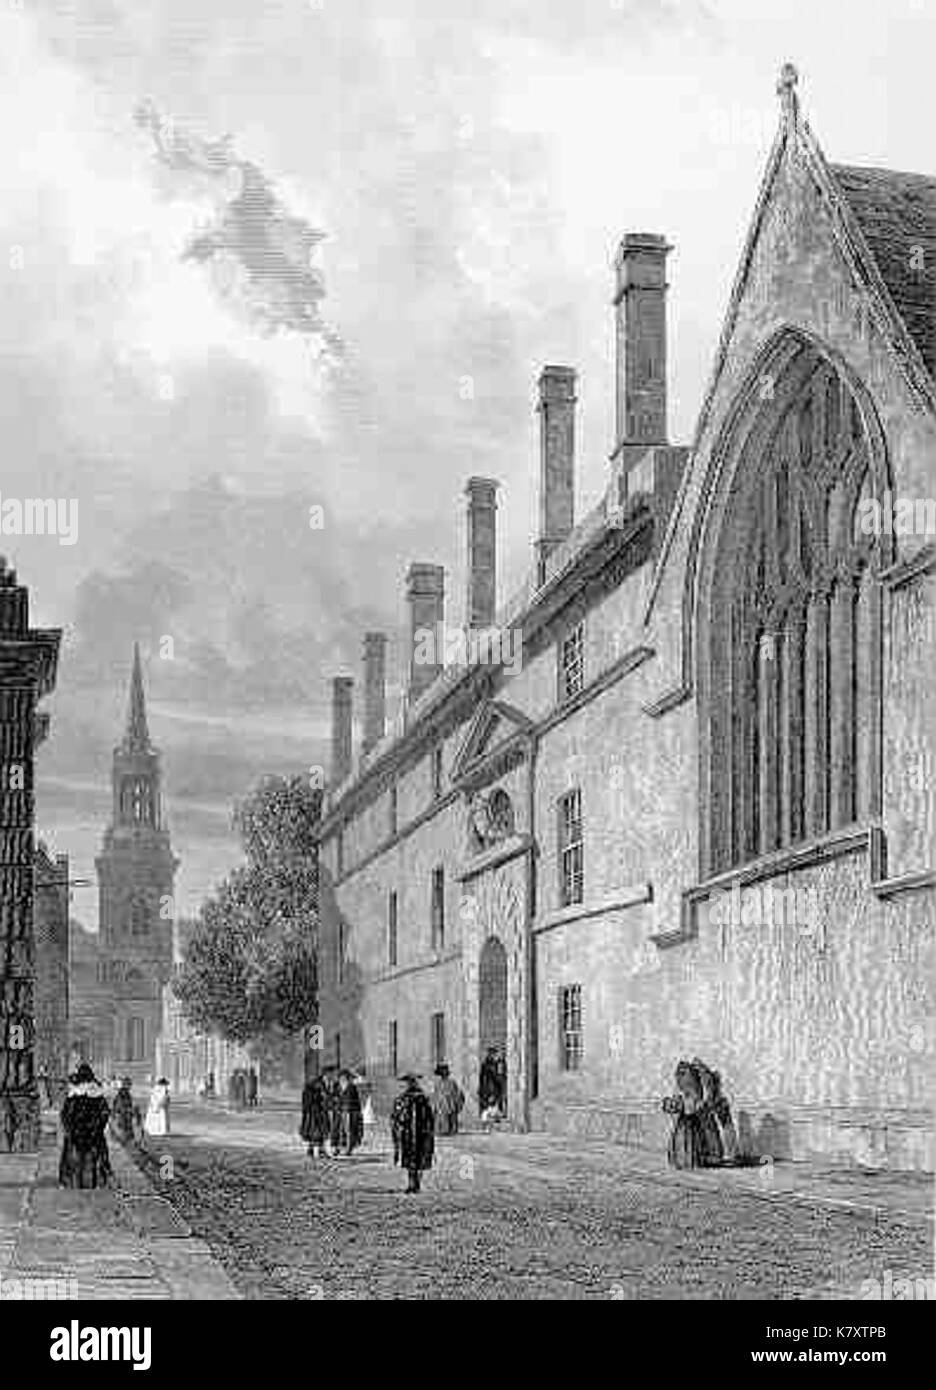 Jesus College engraving 1839 - Stock Image